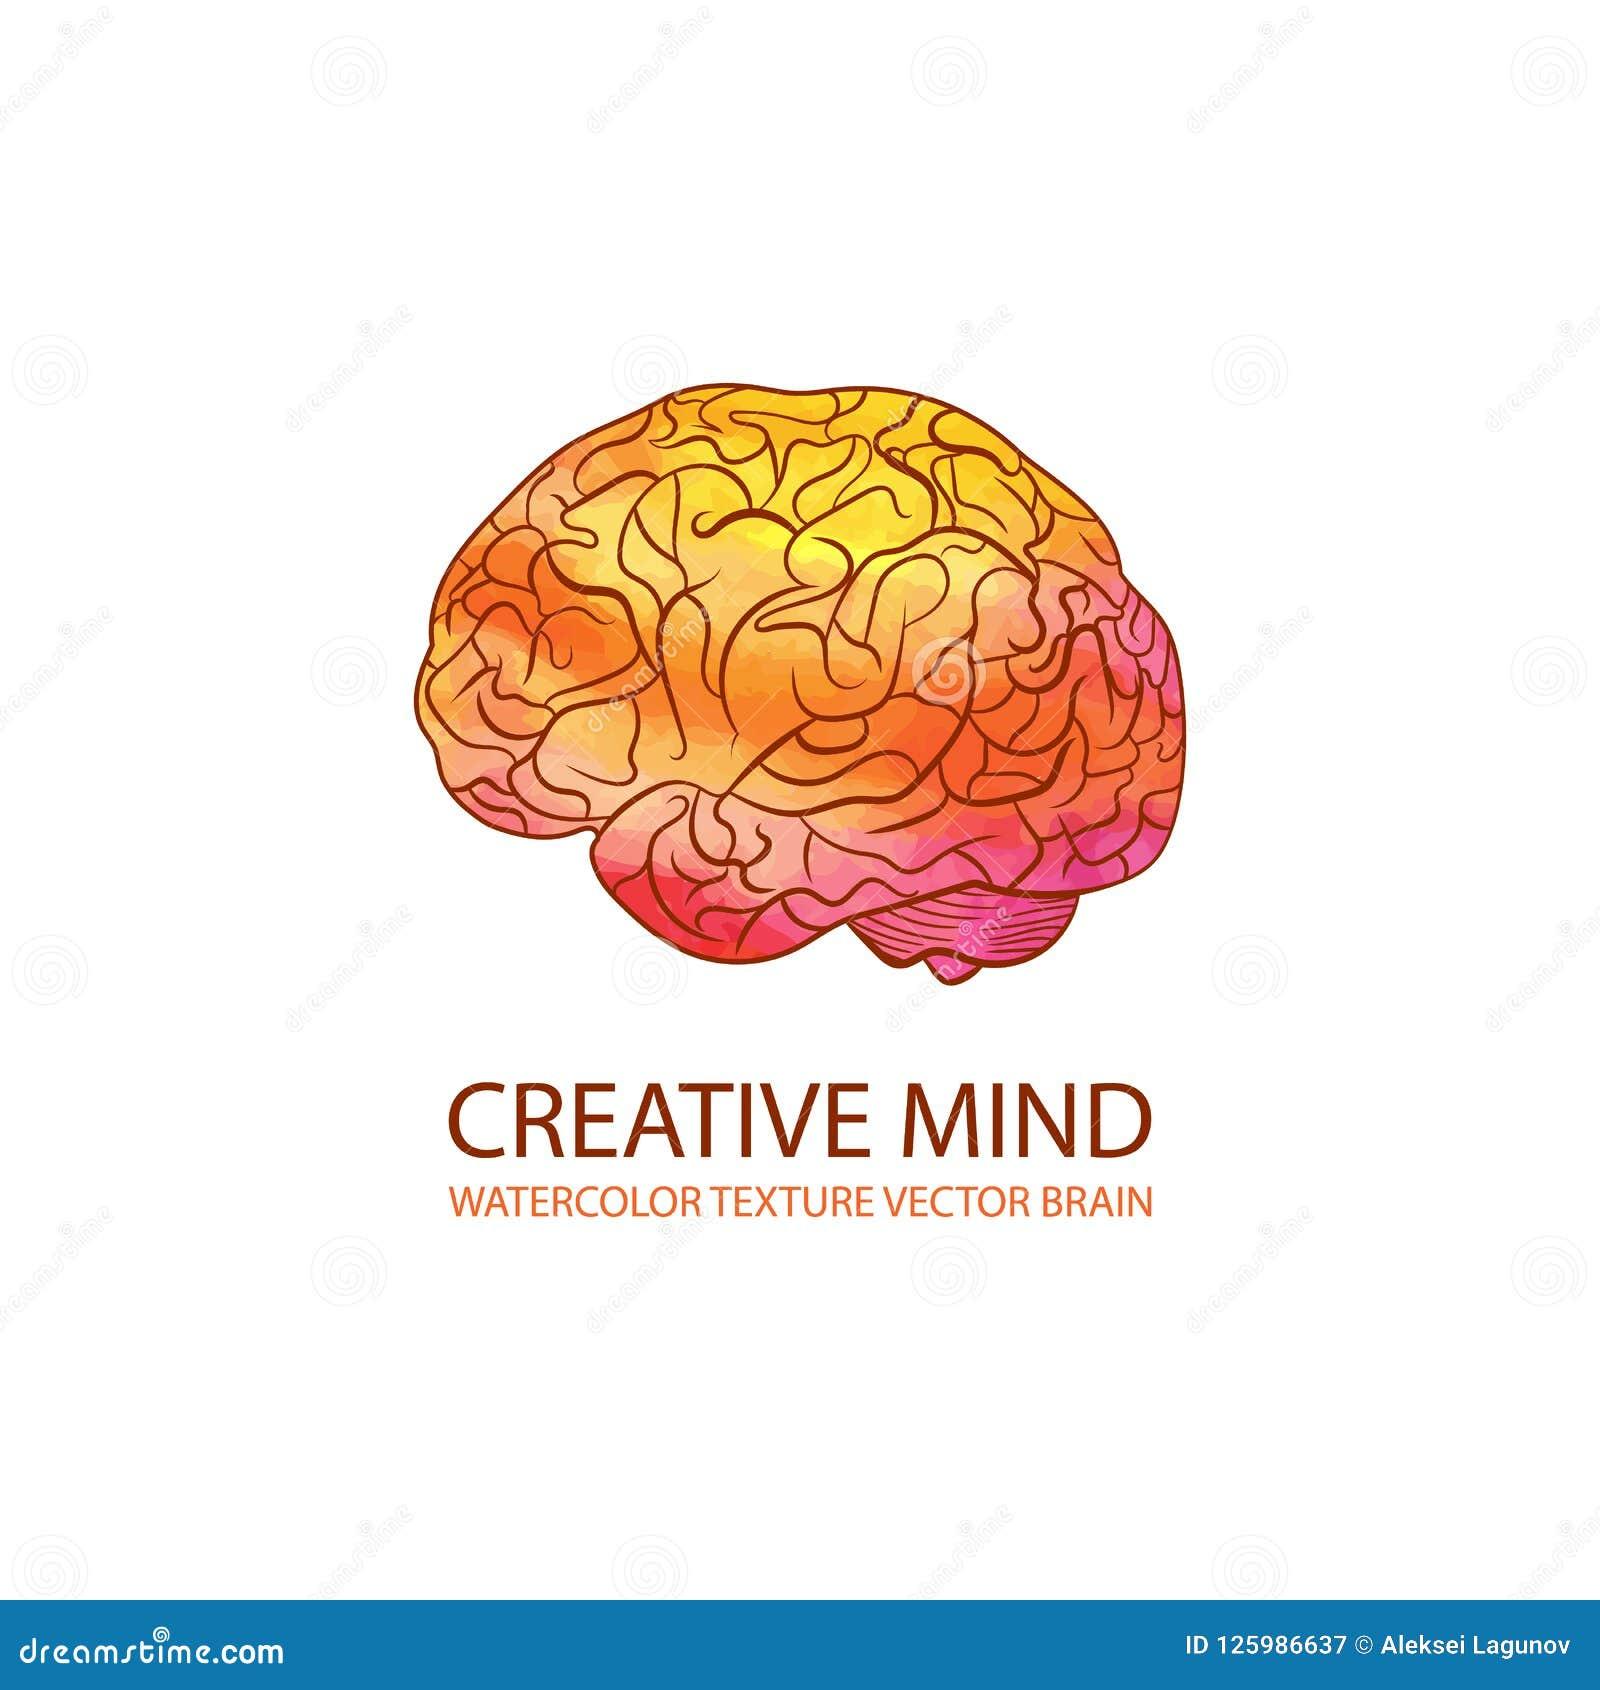 Vector Creative Mind Illustration, Watercolor Gradient Colorful Brain, Logo Template.